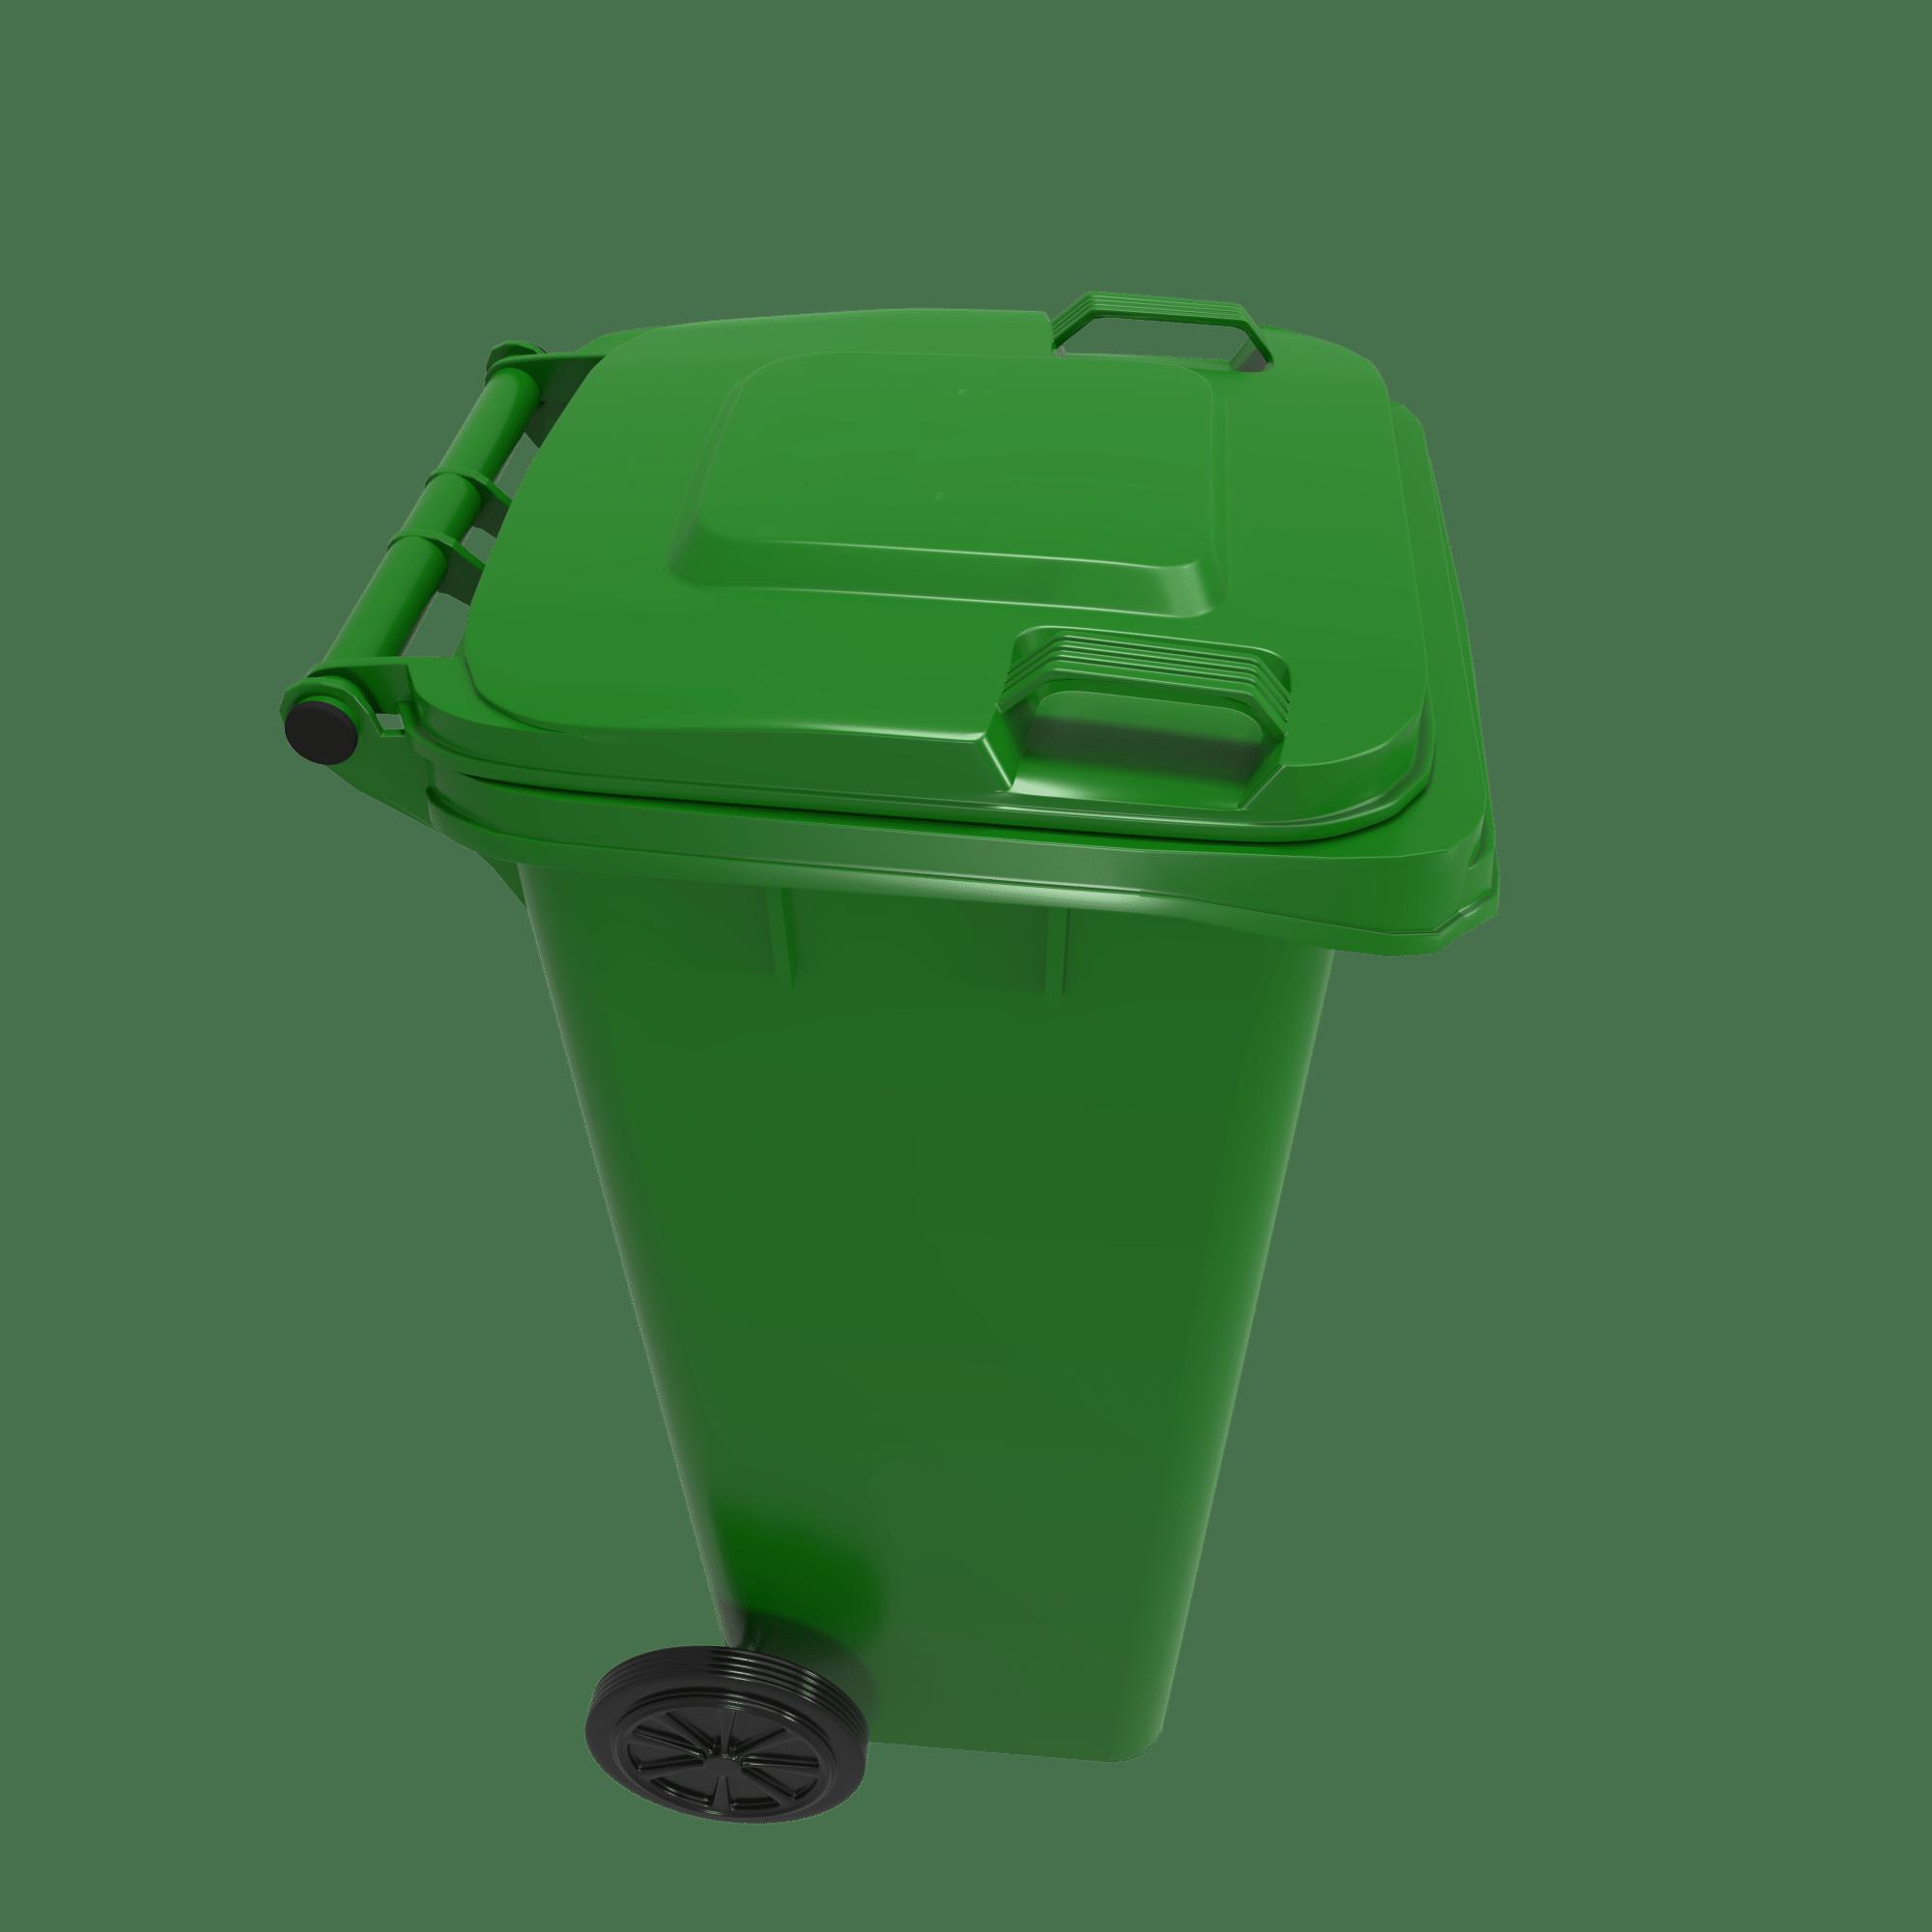 Resiglas Outdoor Garbage Bin